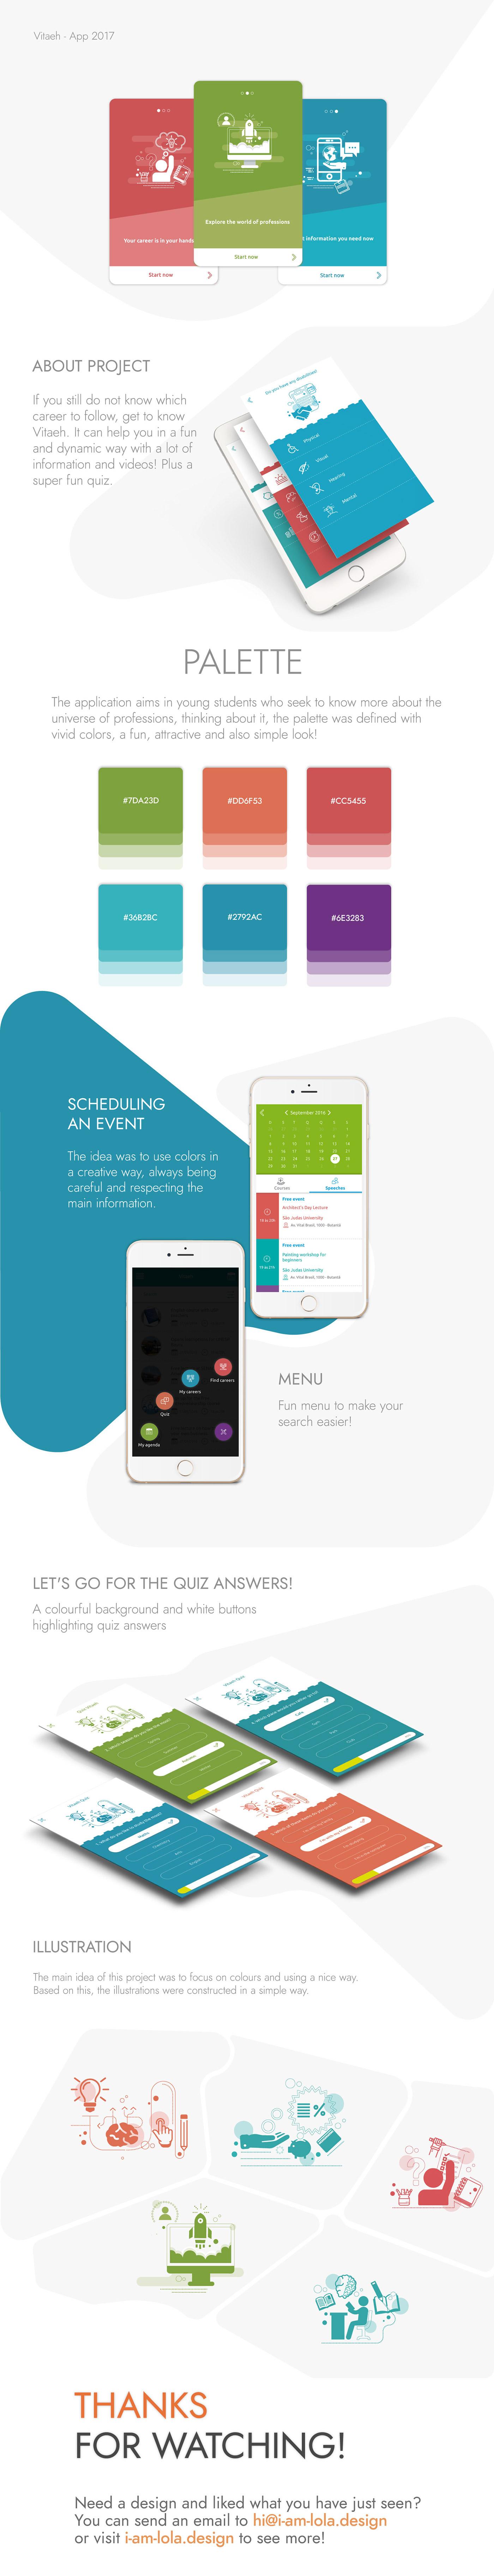 app adobeillustrator career Quiz ios android acessibility